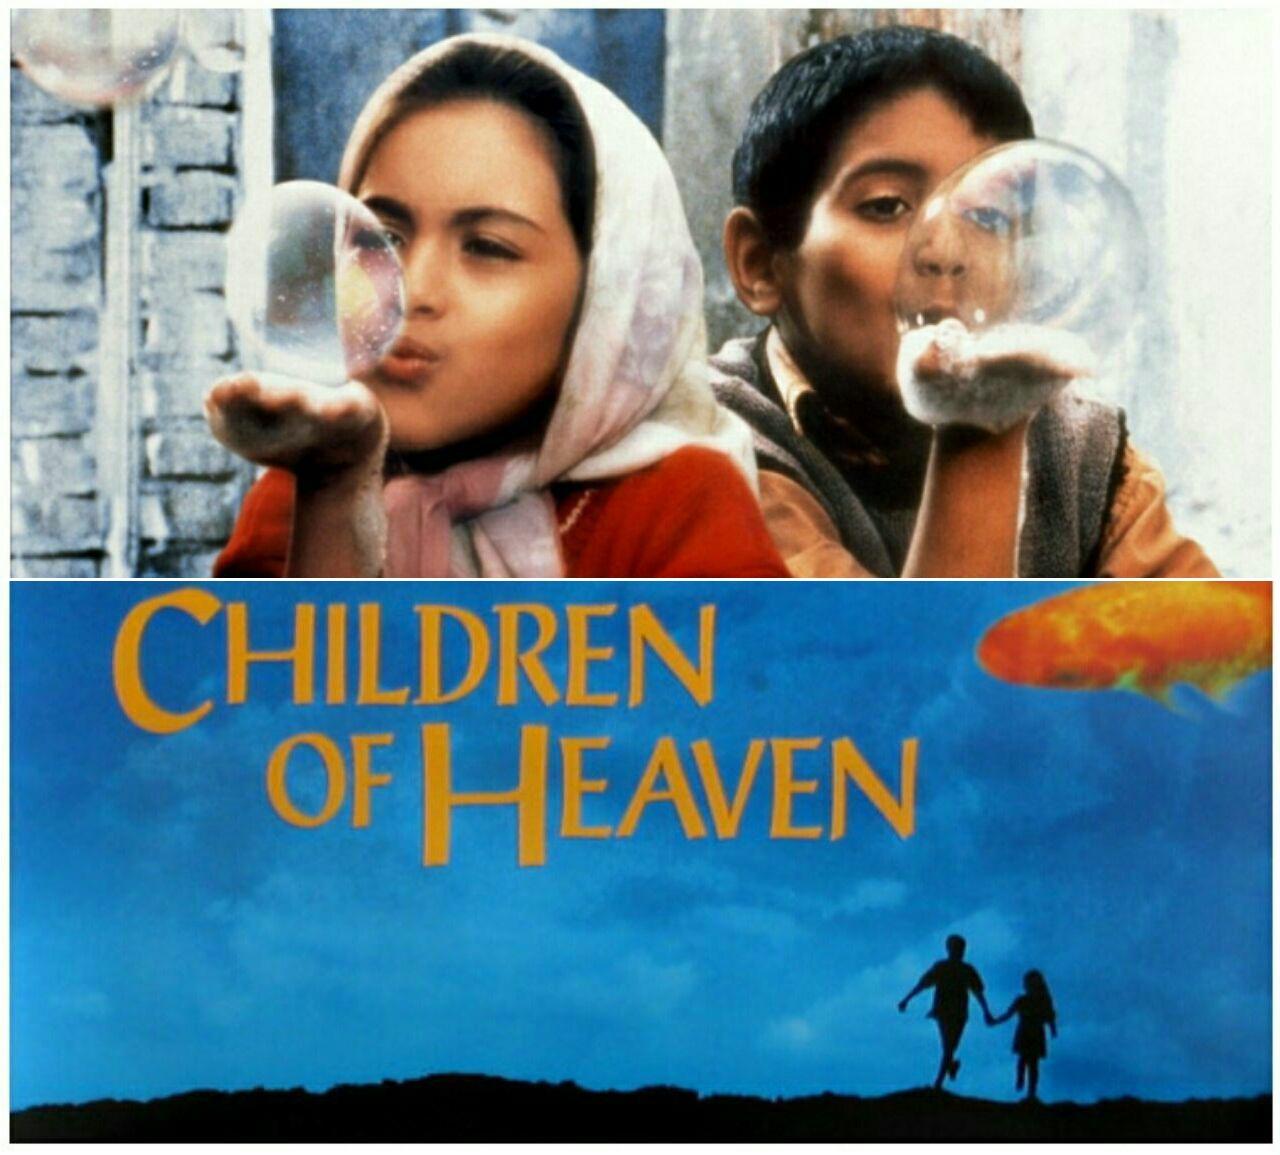 www.dustaan.com تدریس فیلم «مجید مجیدی» در مدارس ژاپن و آمریکا! +عکس